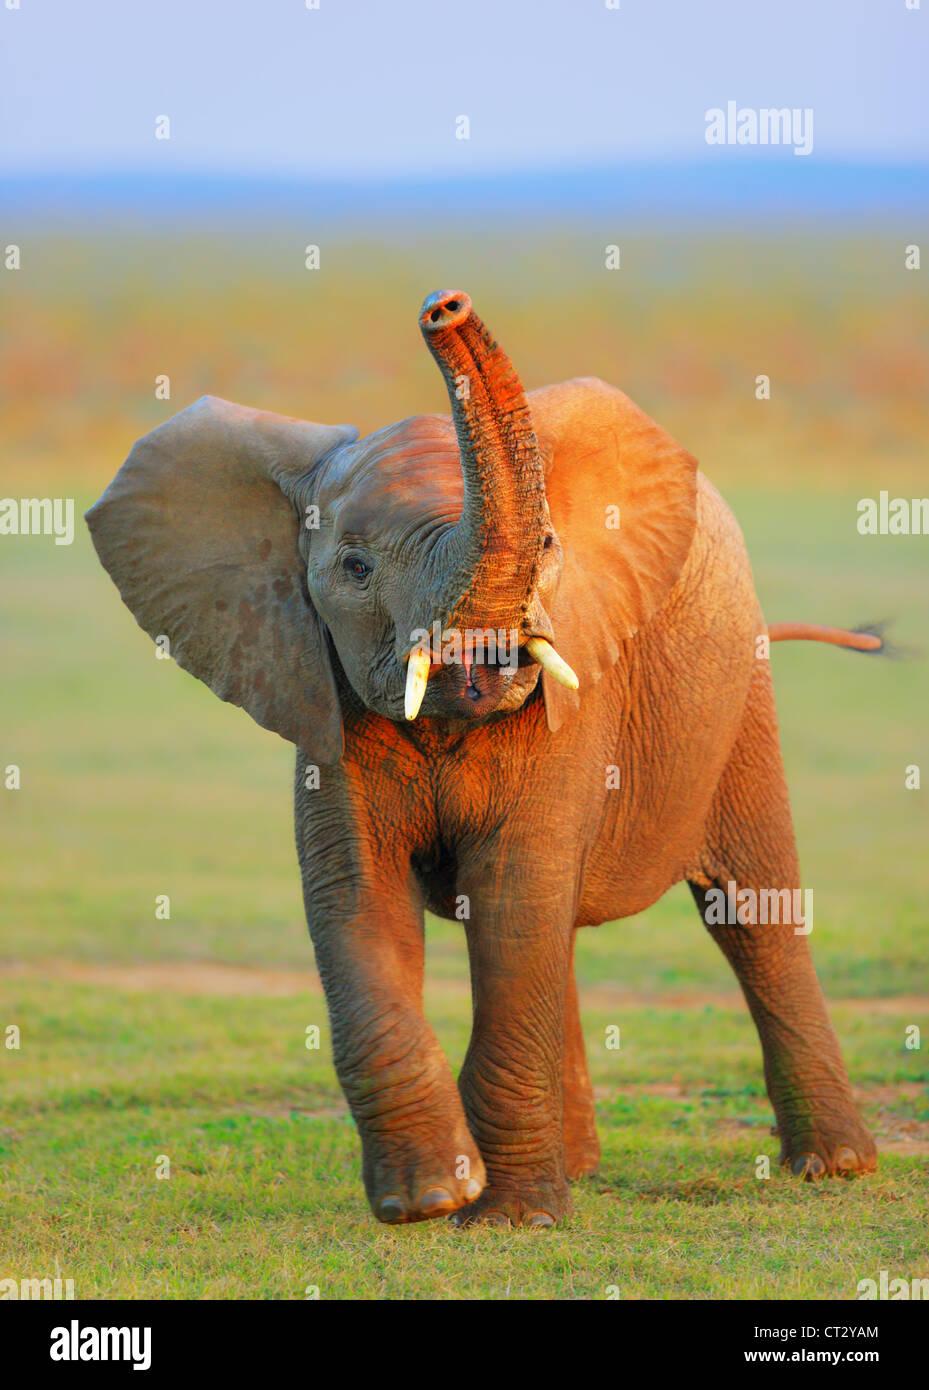 Baby Elephant con tronco sollevato - Addo Elephant National Park - Sud Africa Immagini Stock